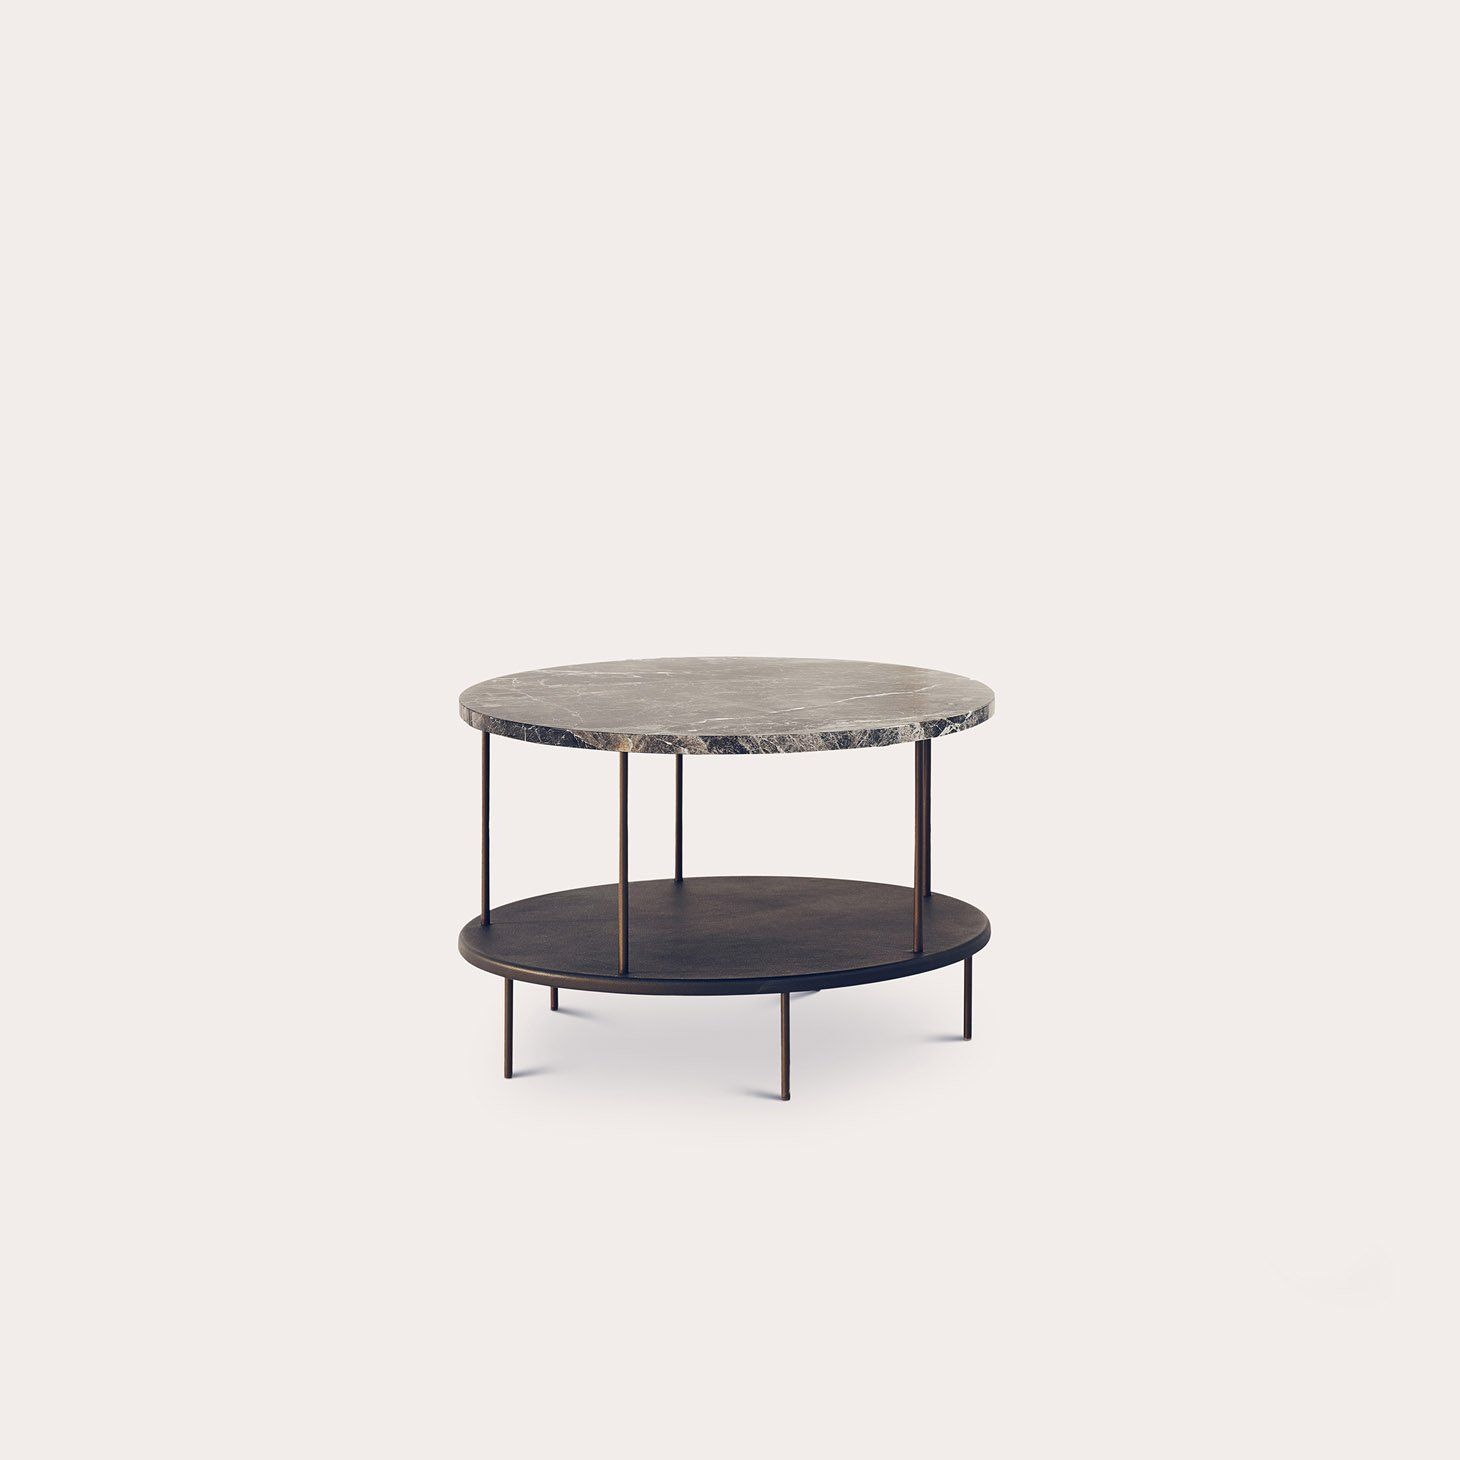 Cheap Studio Apartments Vancouver: DD Table Tables Jaime Hayon Designer Furniture Sku: 758